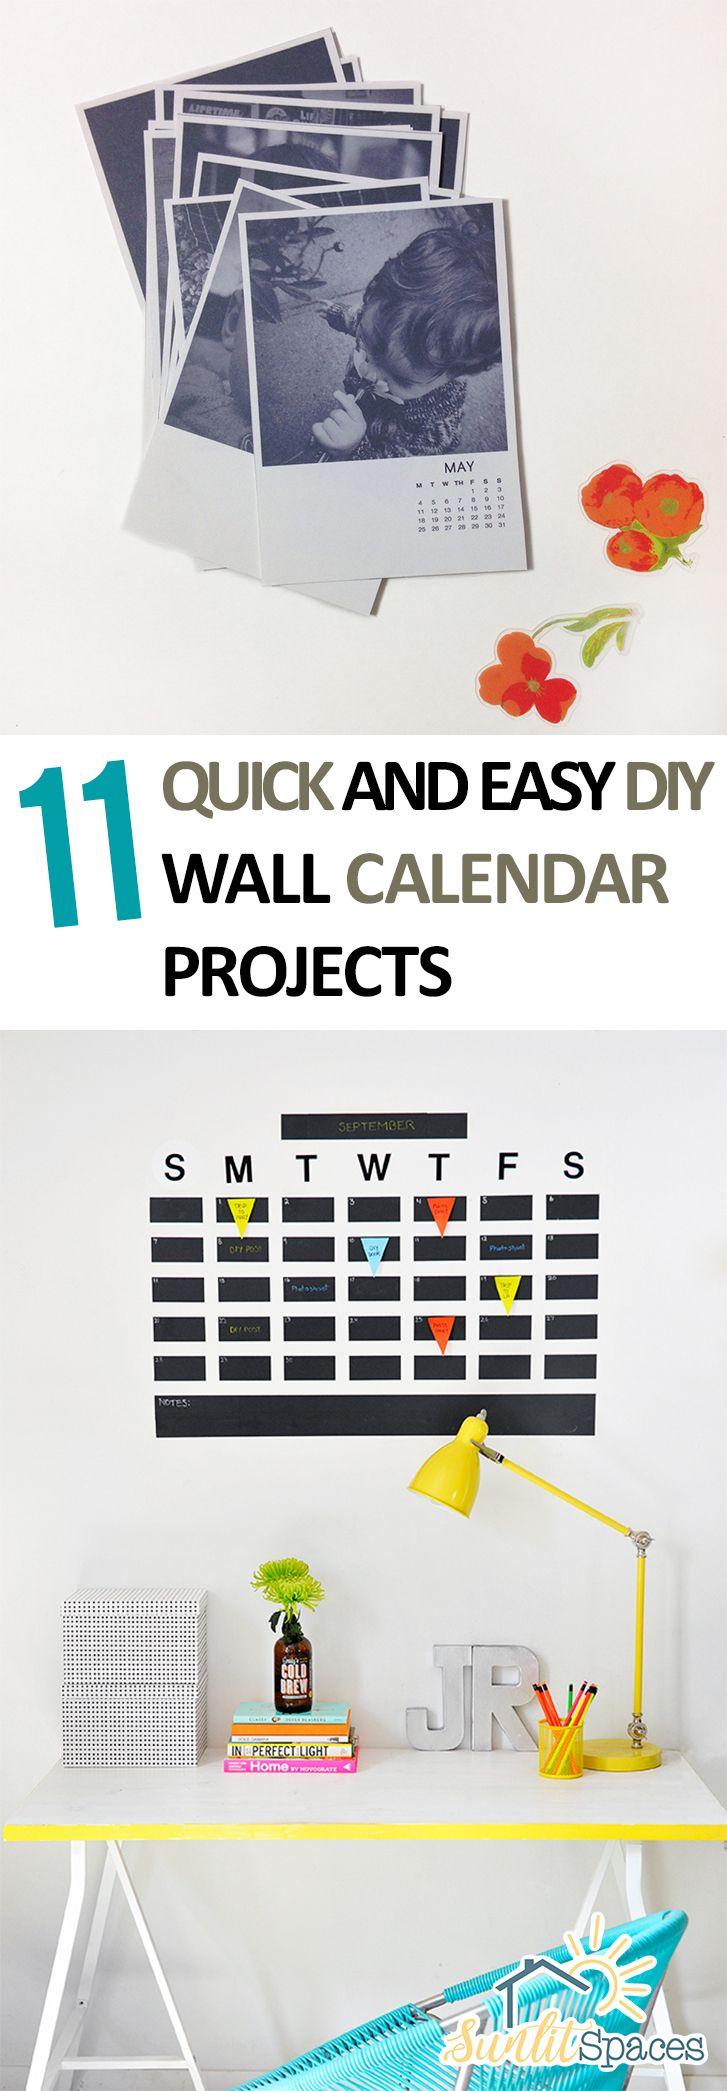 11 quick and easy diy wall calendar projects diy wall and easy 11 quick and easy diy wall calendar projects solutioingenieria Gallery